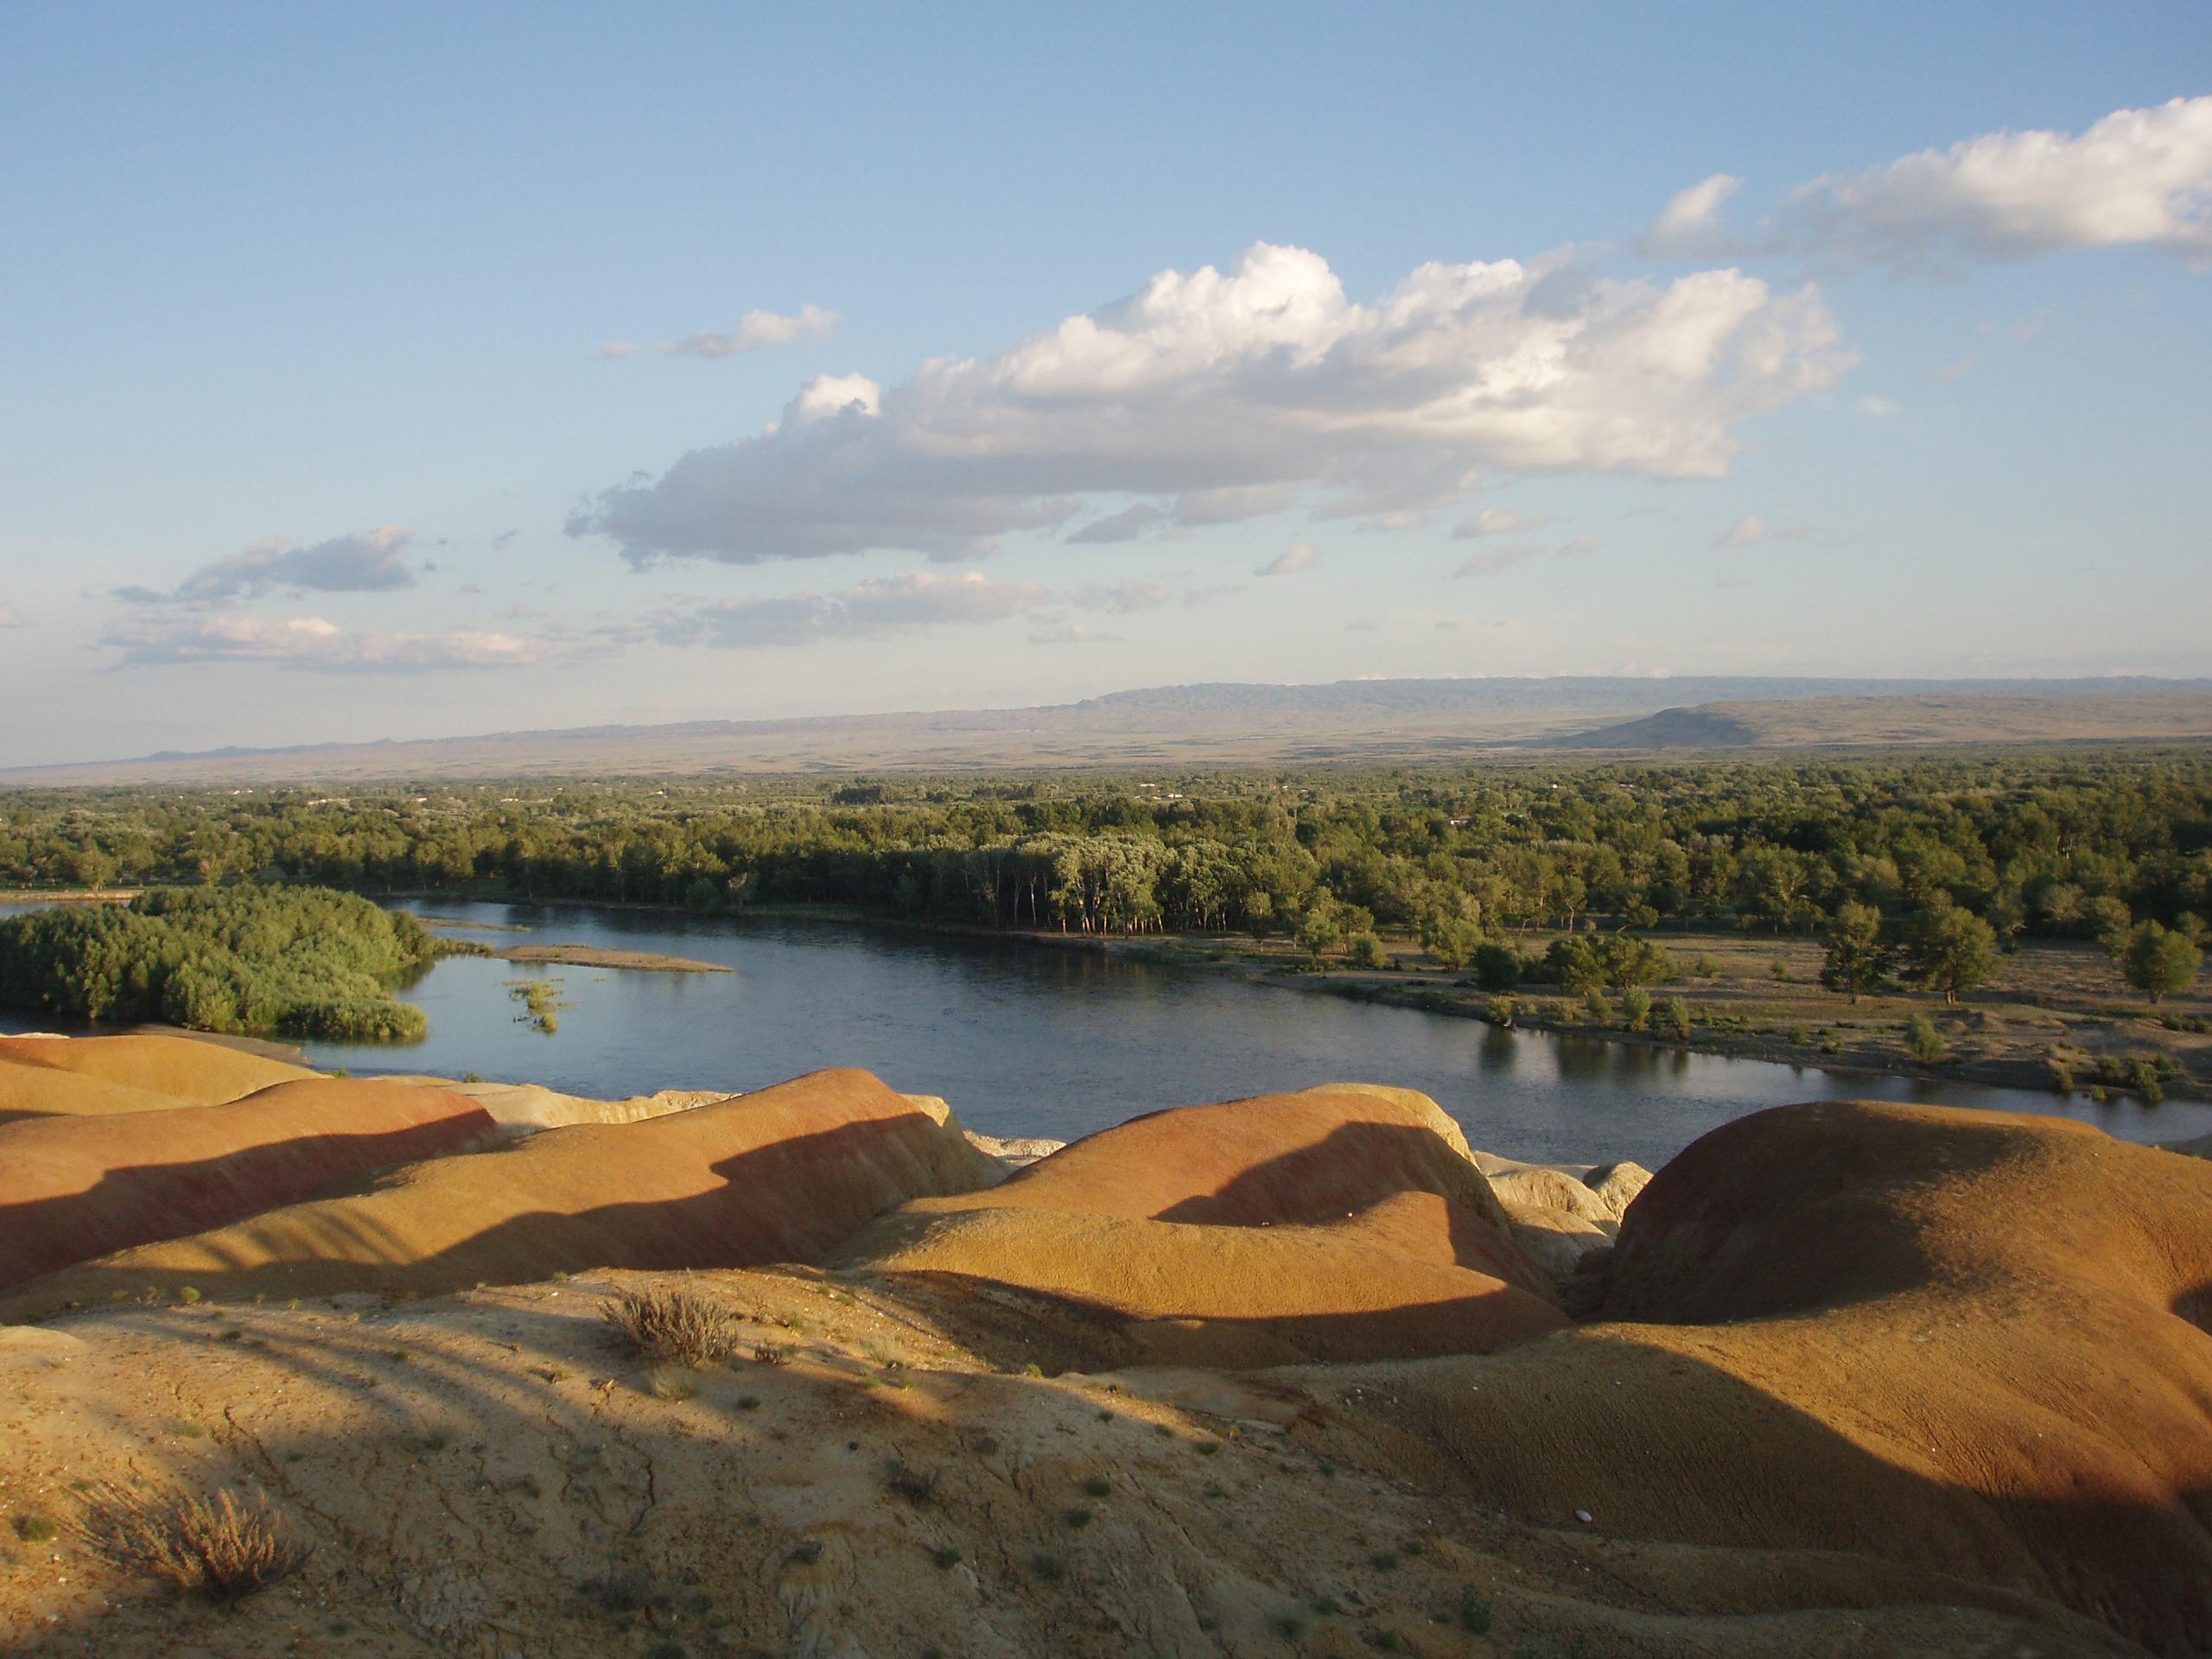 Black Irtysh river in Burqin County.